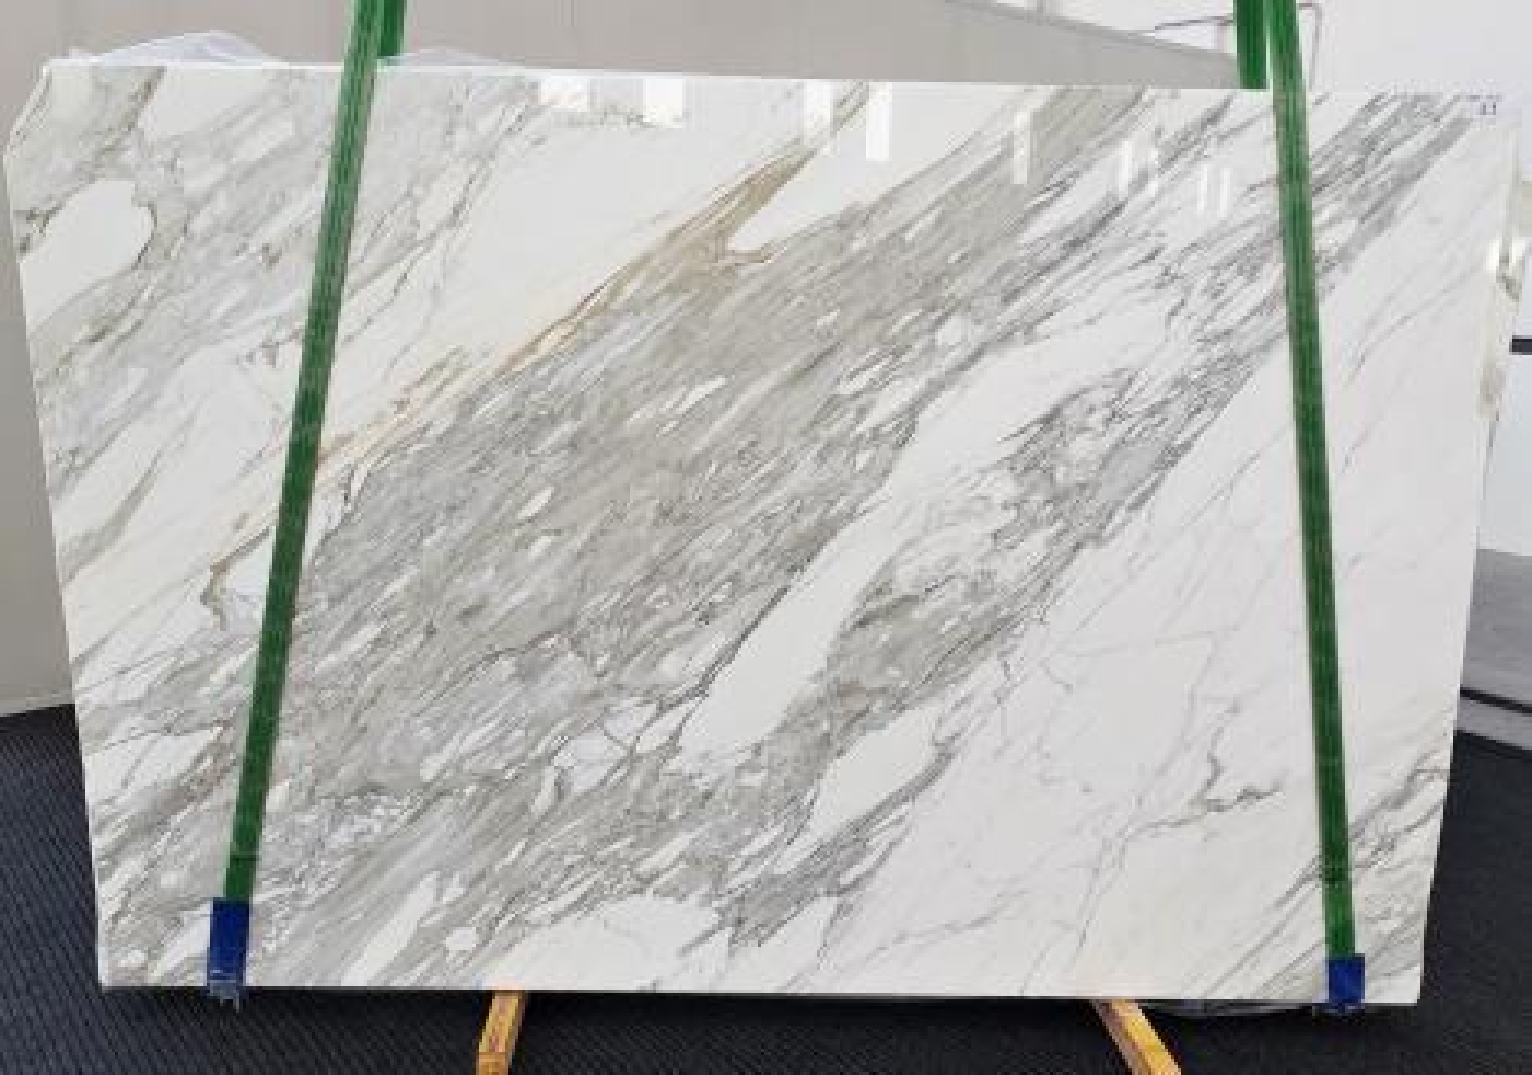 CALACATTA Fourniture Veneto (Italie) d' dalles brillantes en marbre naturel 1344 , B - slab #11